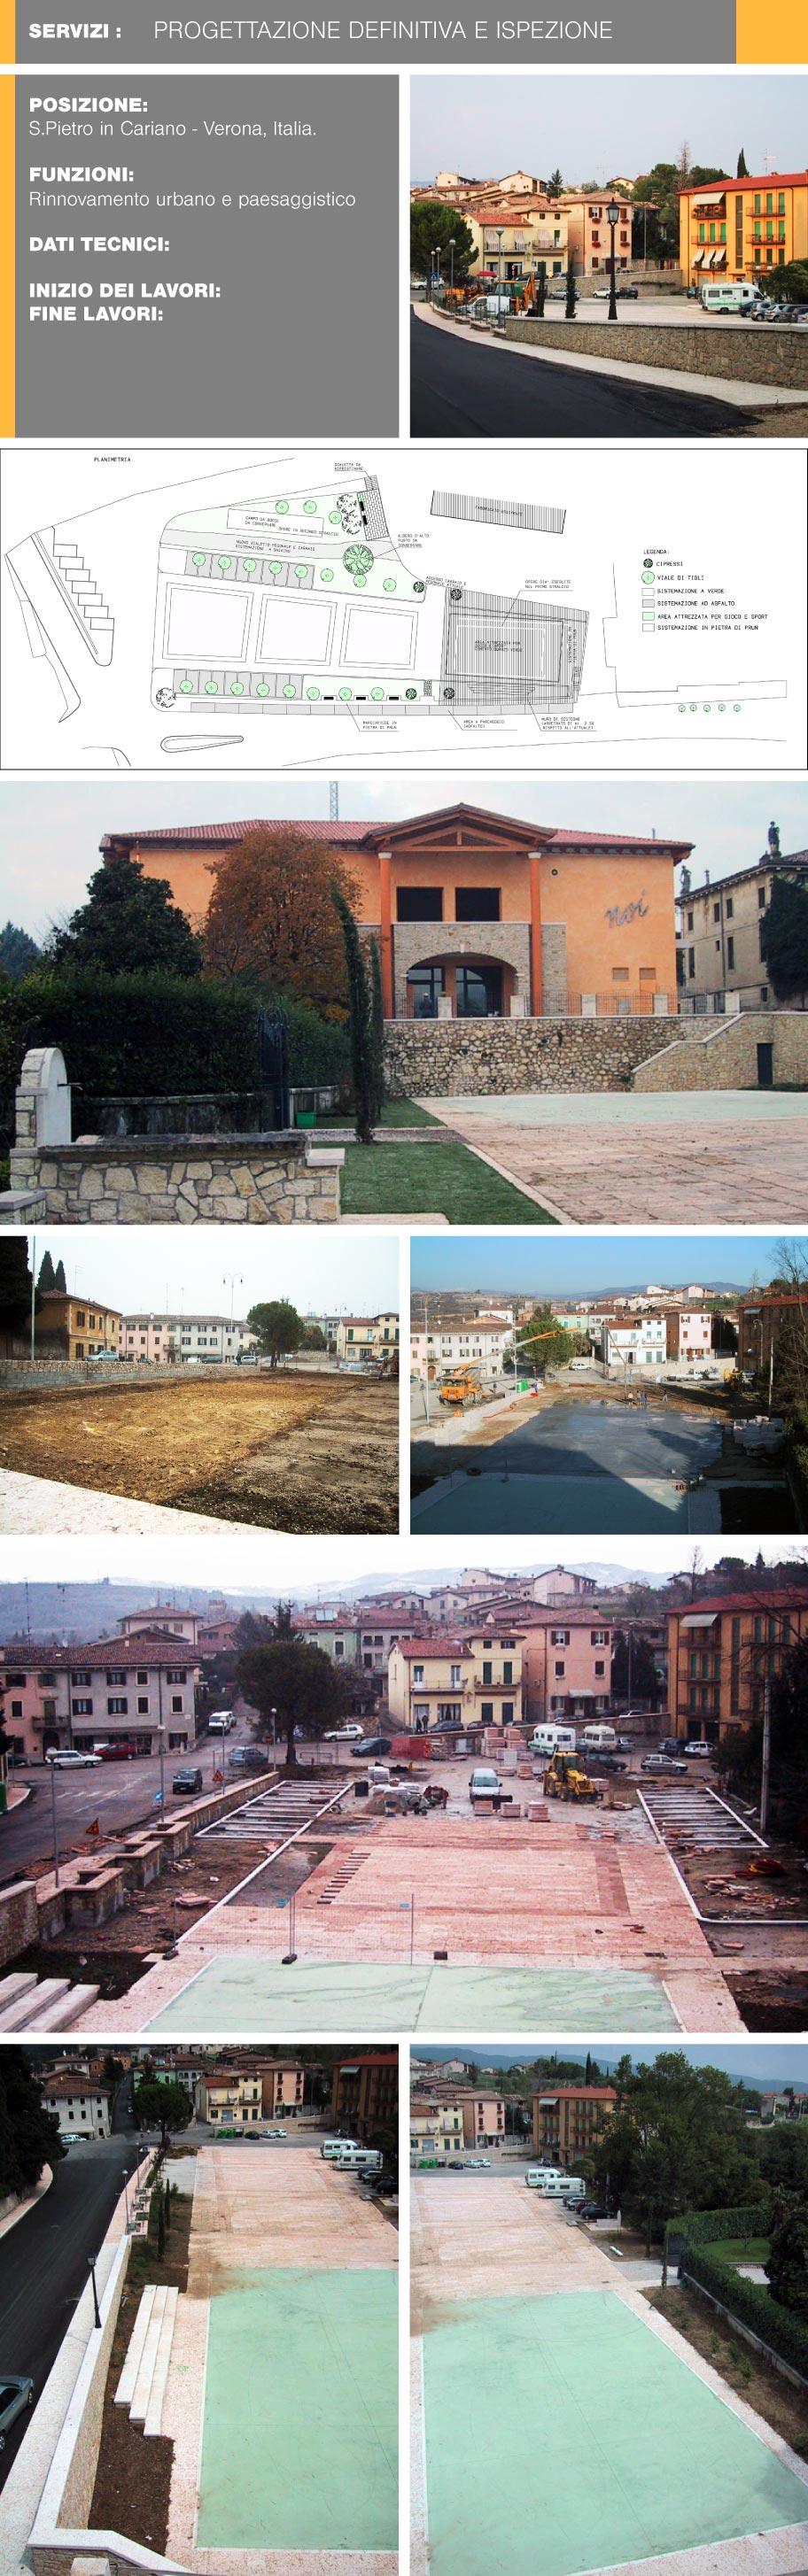 Piazza_SanGiusepper_ita